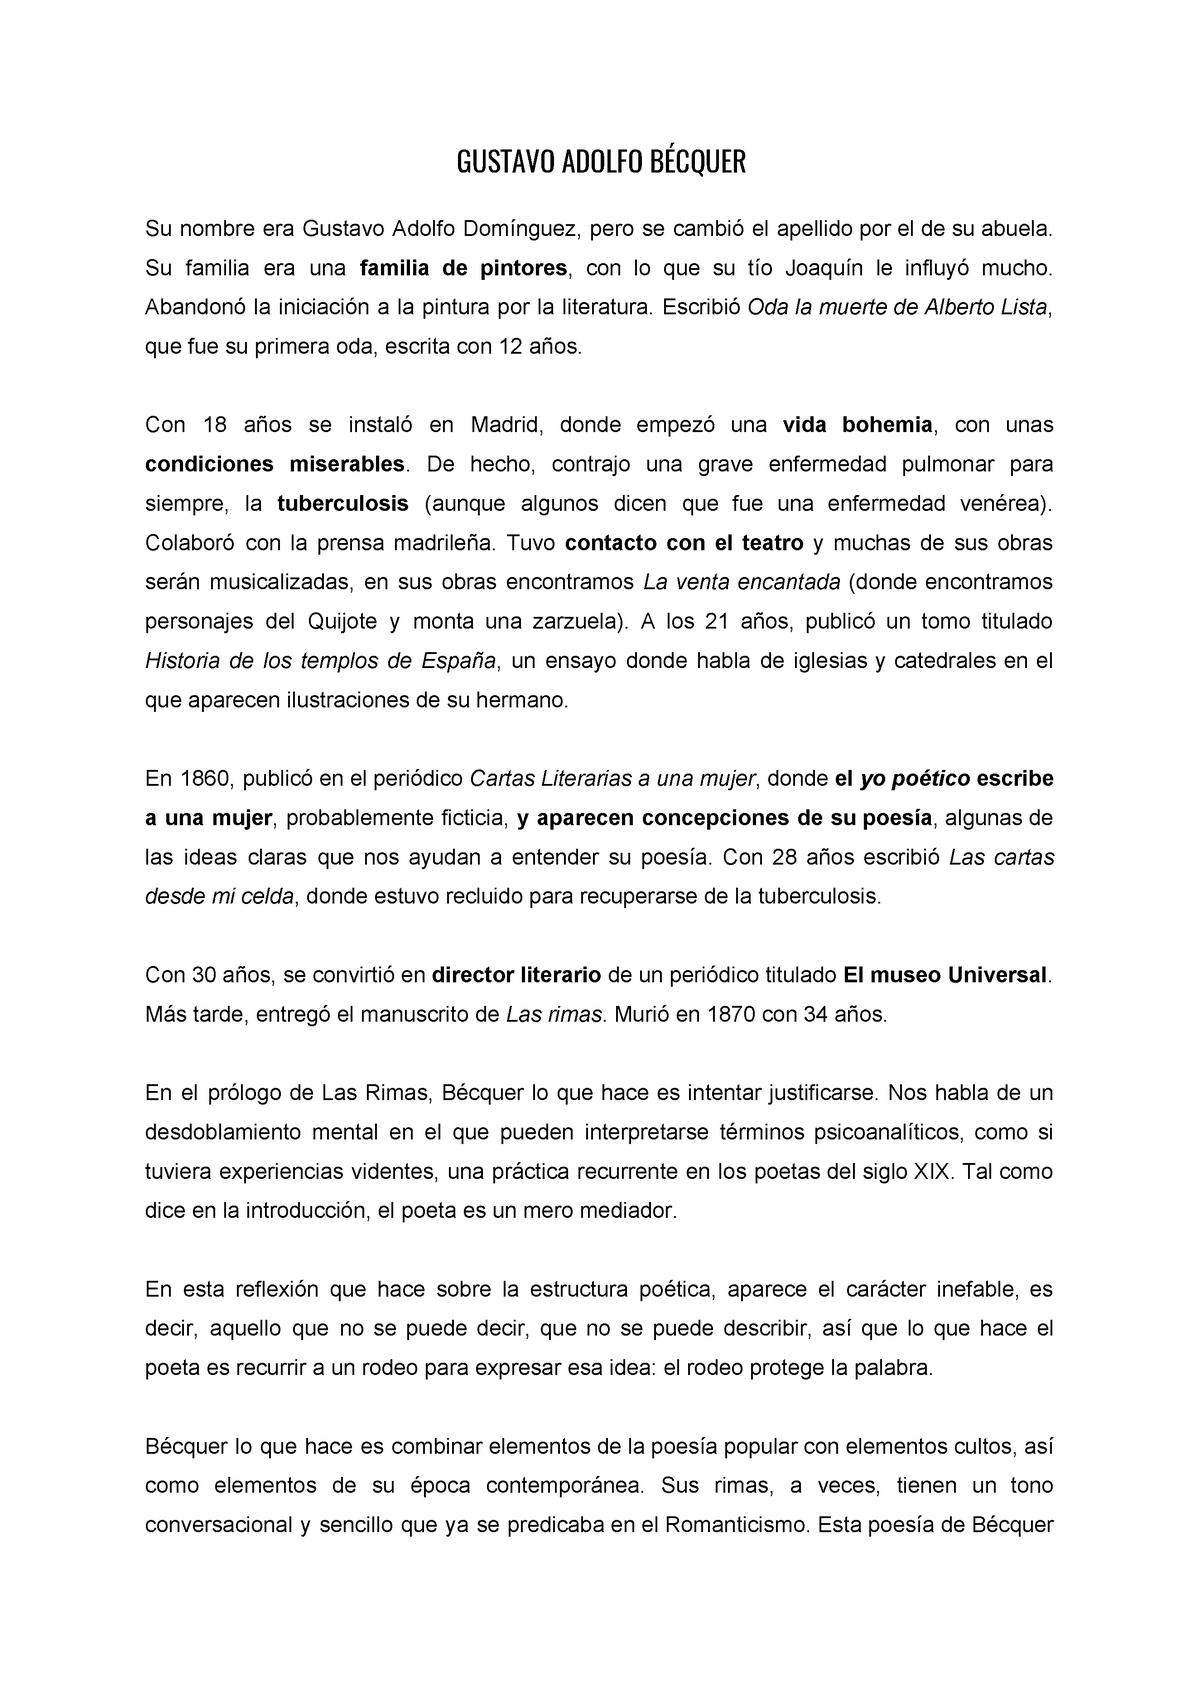 Gustavo Adolfo Bécquer Ub Studocu